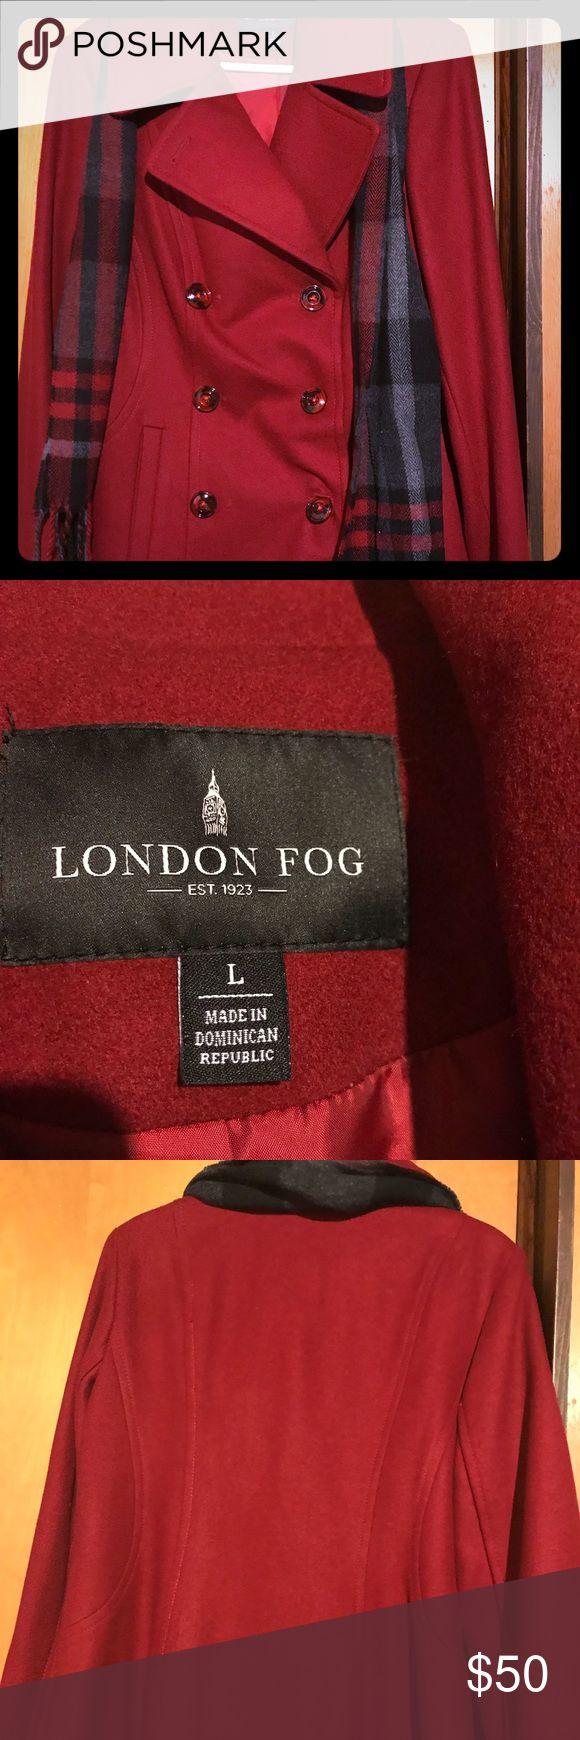 London Fog Red Pea coat size L London Fog Red Pea coat size L. Fairly new London Fog Jackets & Coats Pea Coats